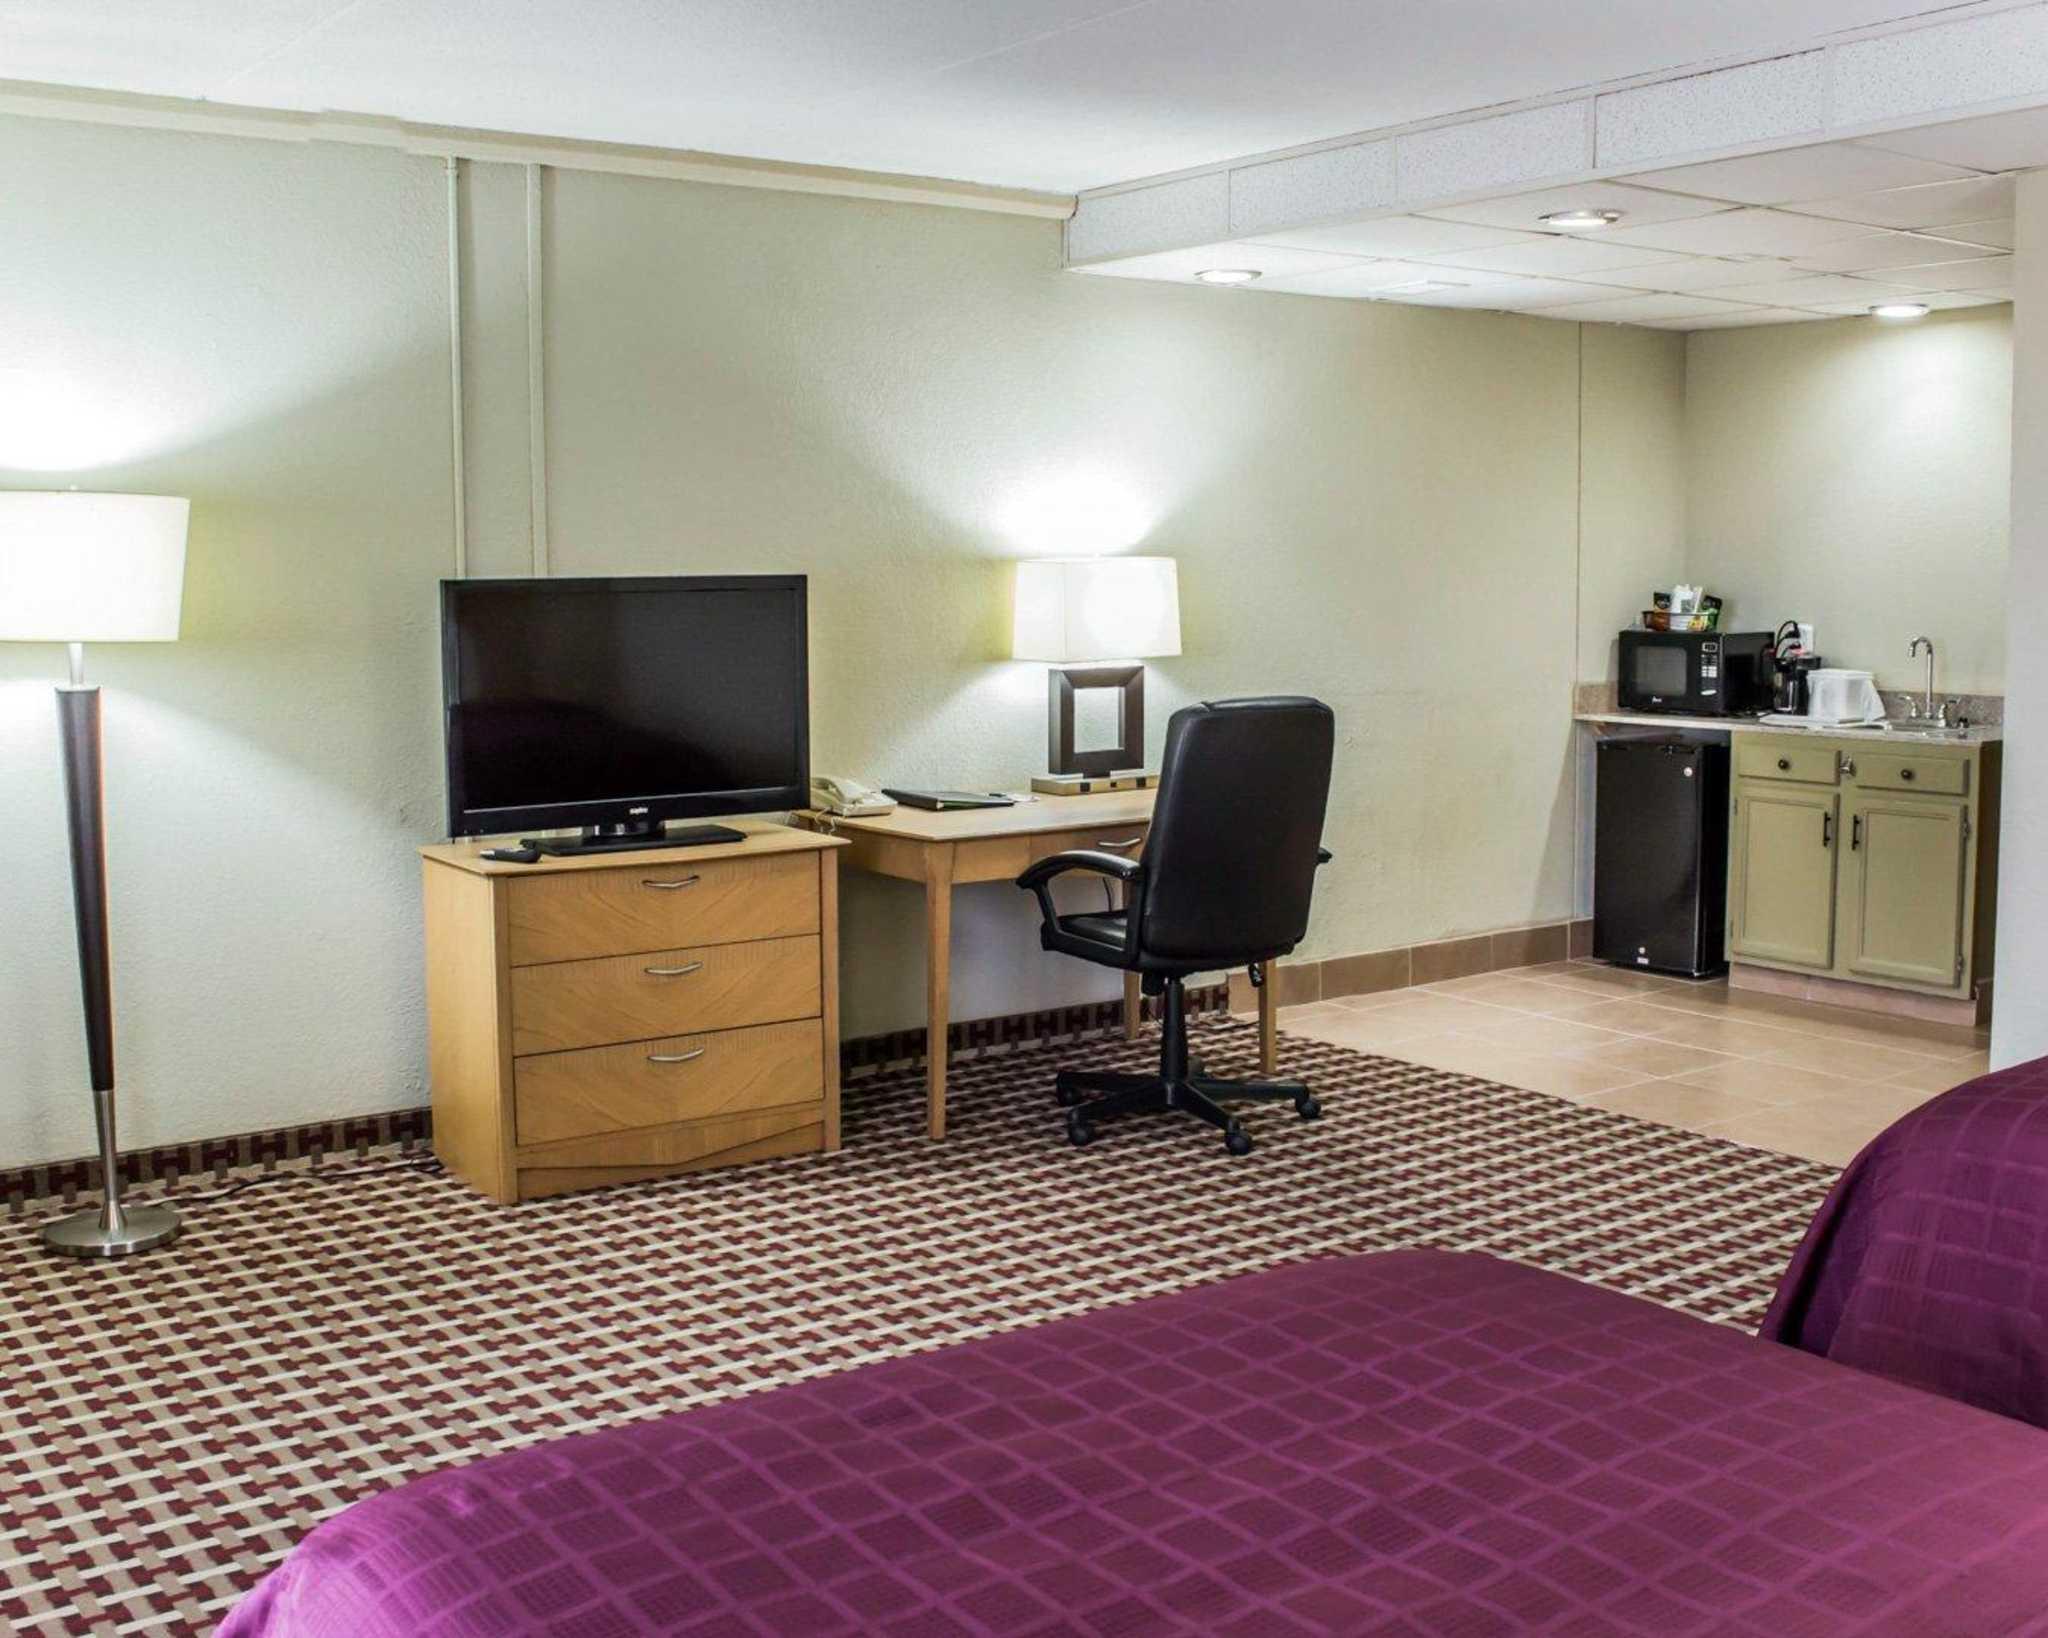 Quality Inn & Suites Fort Bragg image 29